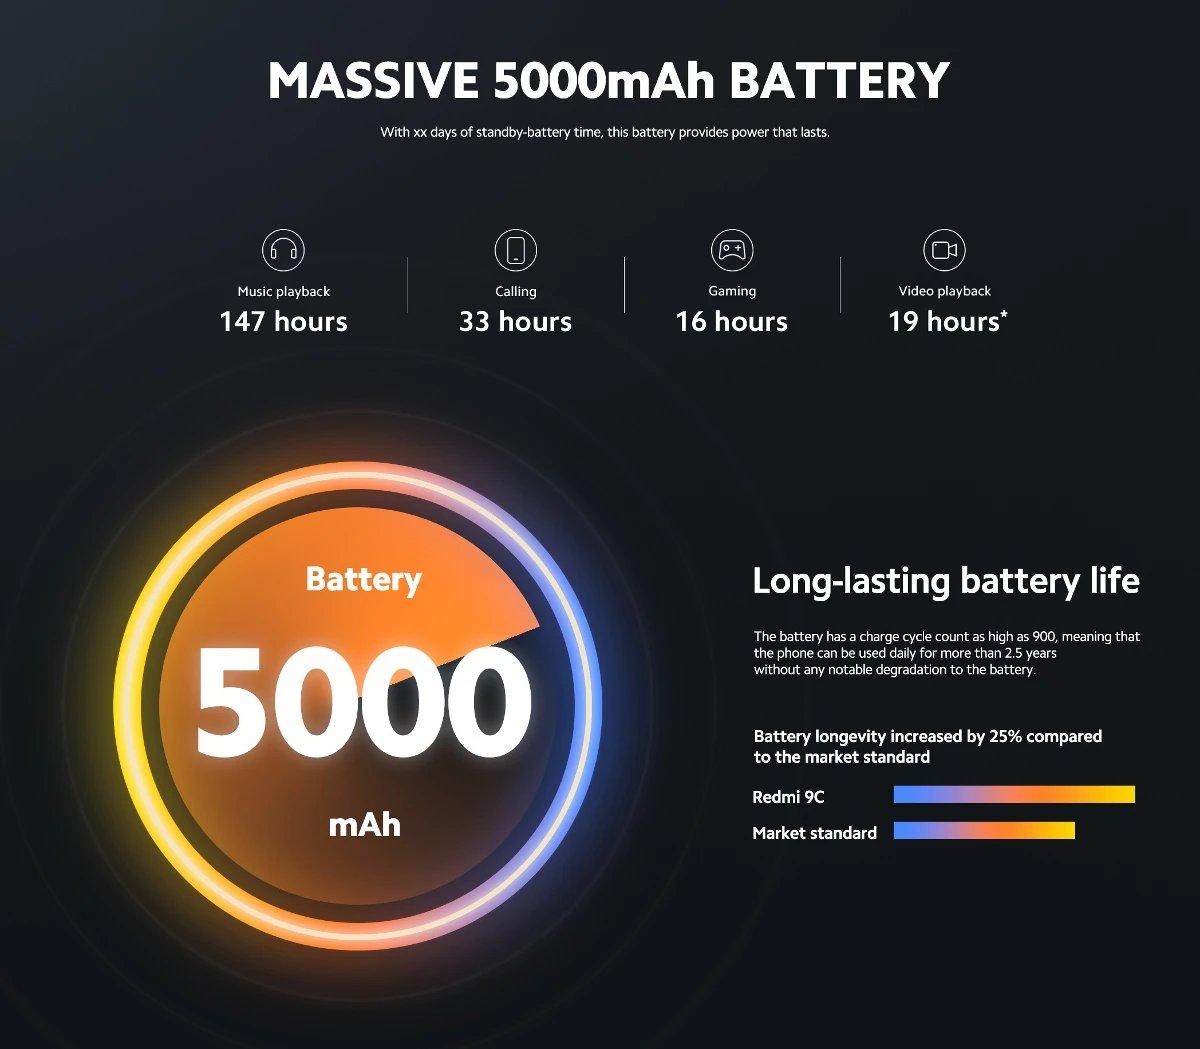 Redmi 9C - 5000mAh battery